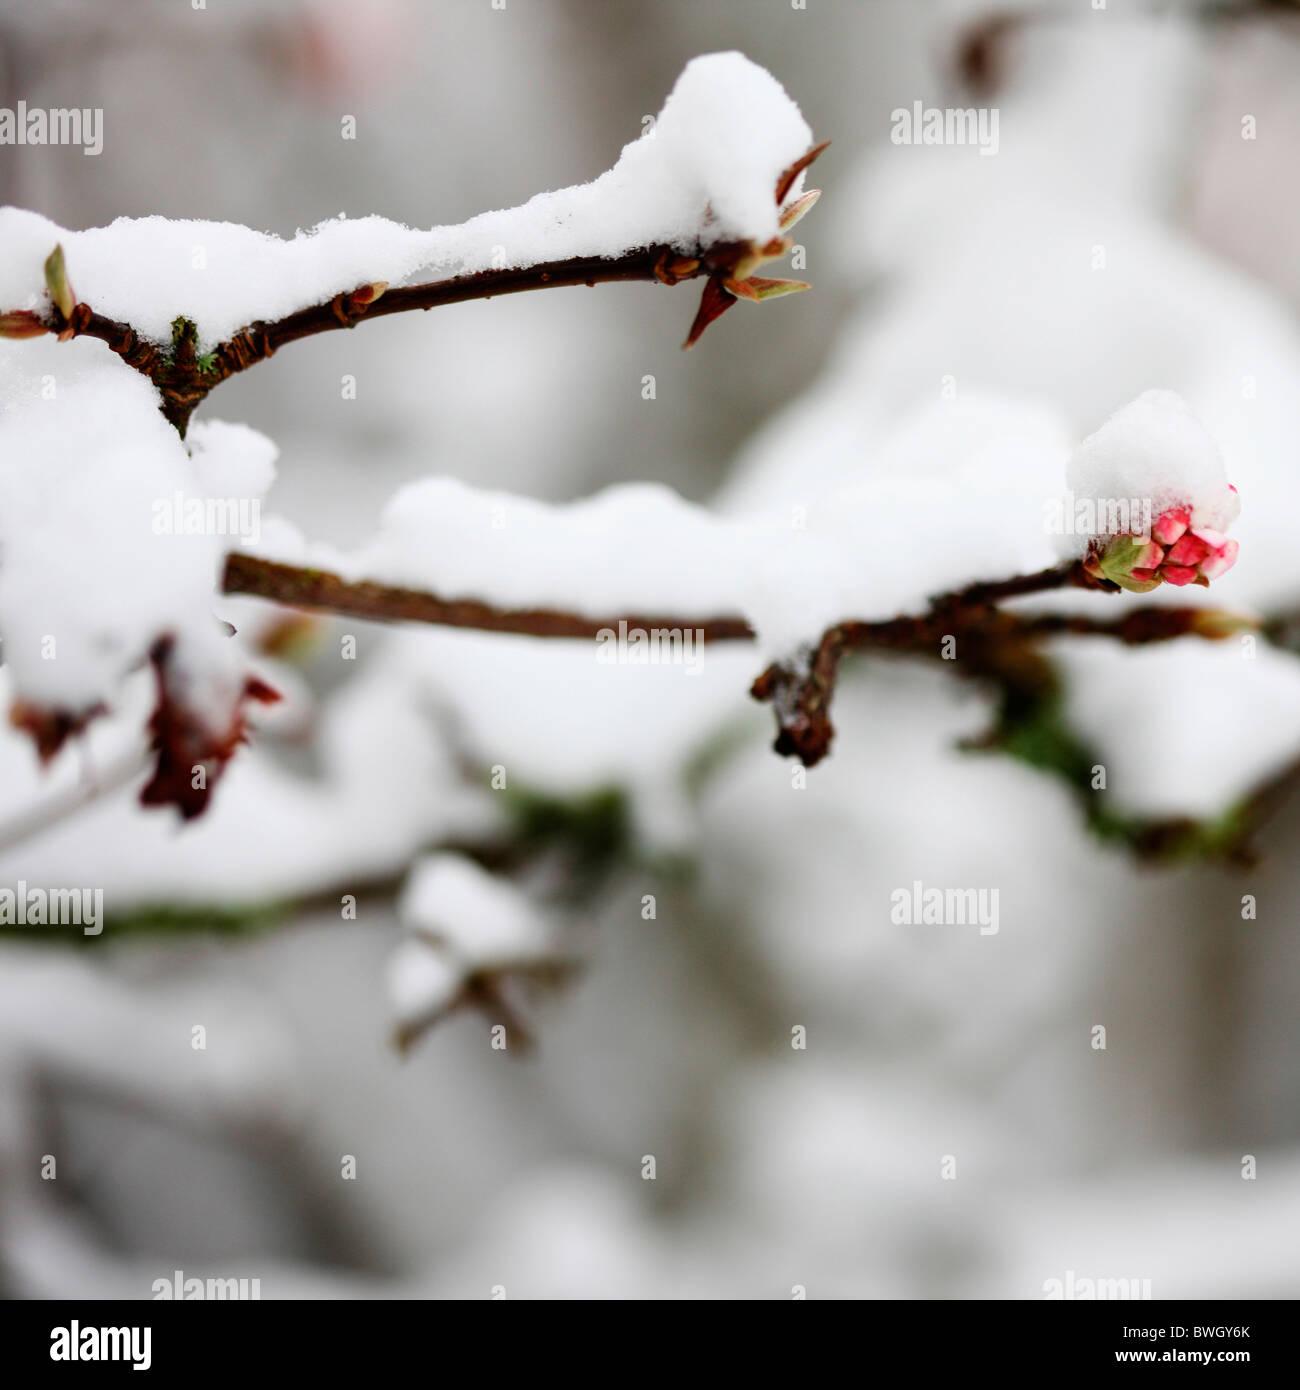 Blüte Knospe im Winterschnee - Fine Art-Fotografie, Jane Ann Butler Fotografie JABP956 RIGHTS MANAGED beschichtet Stockbild